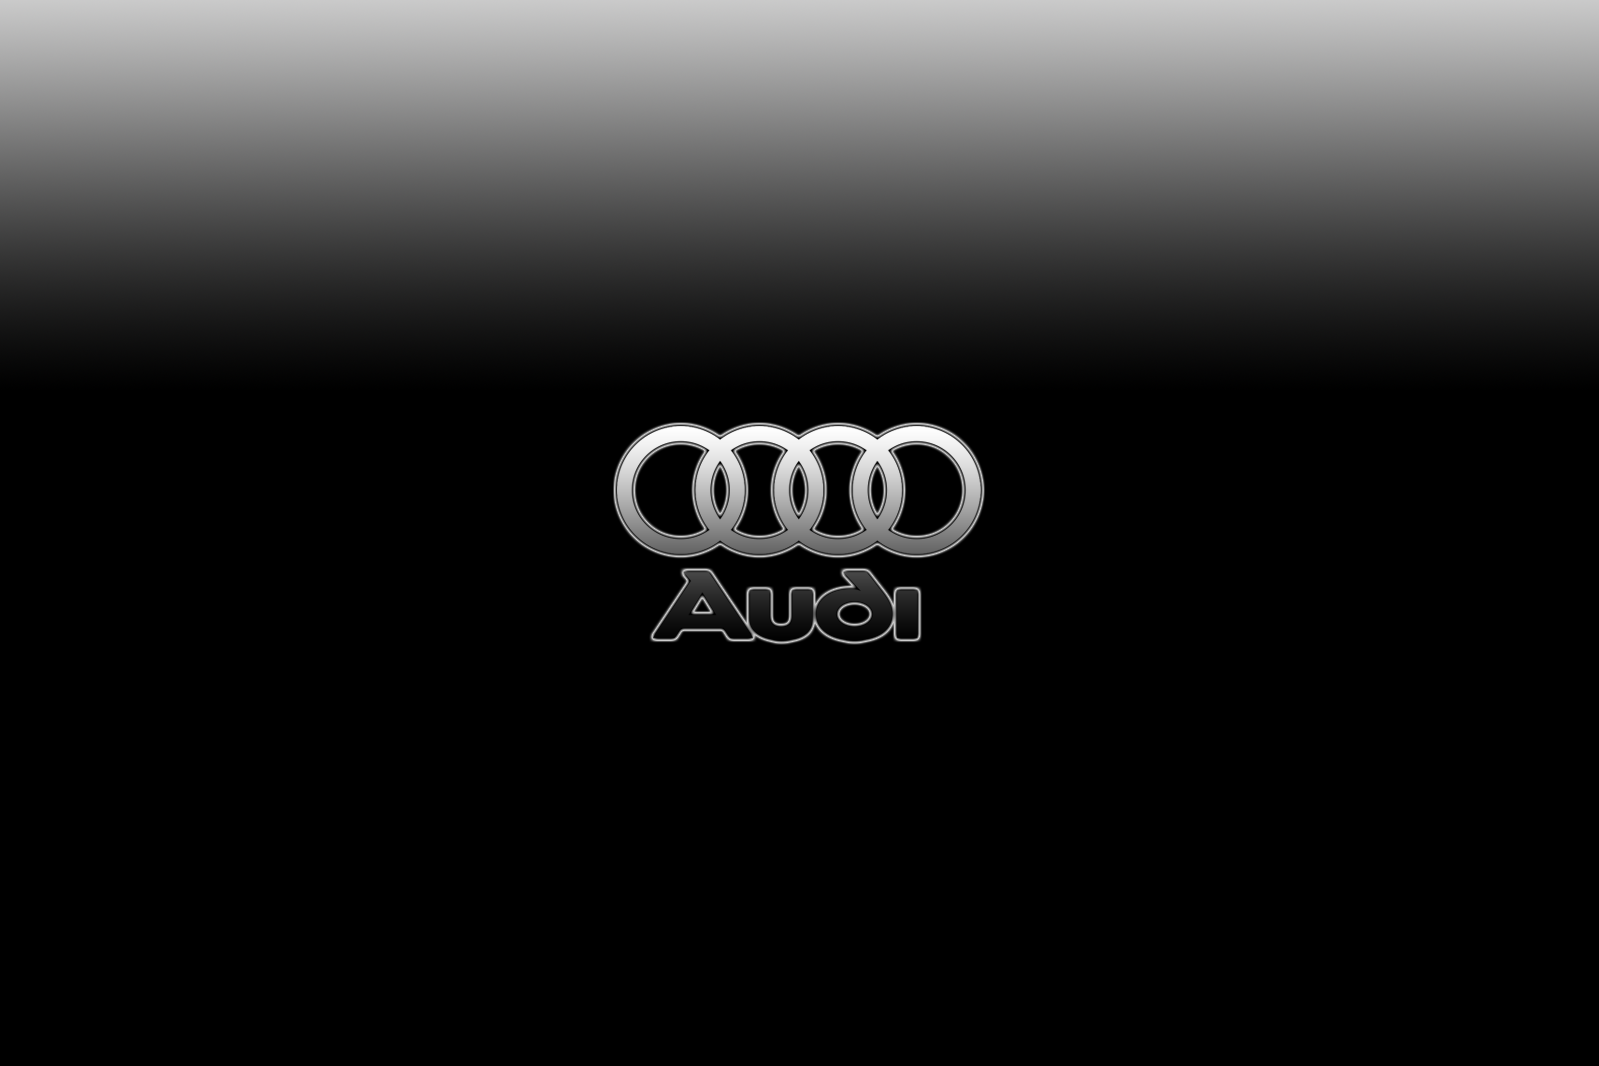 Wallpaper Audi Q3 Hd Wallpapers